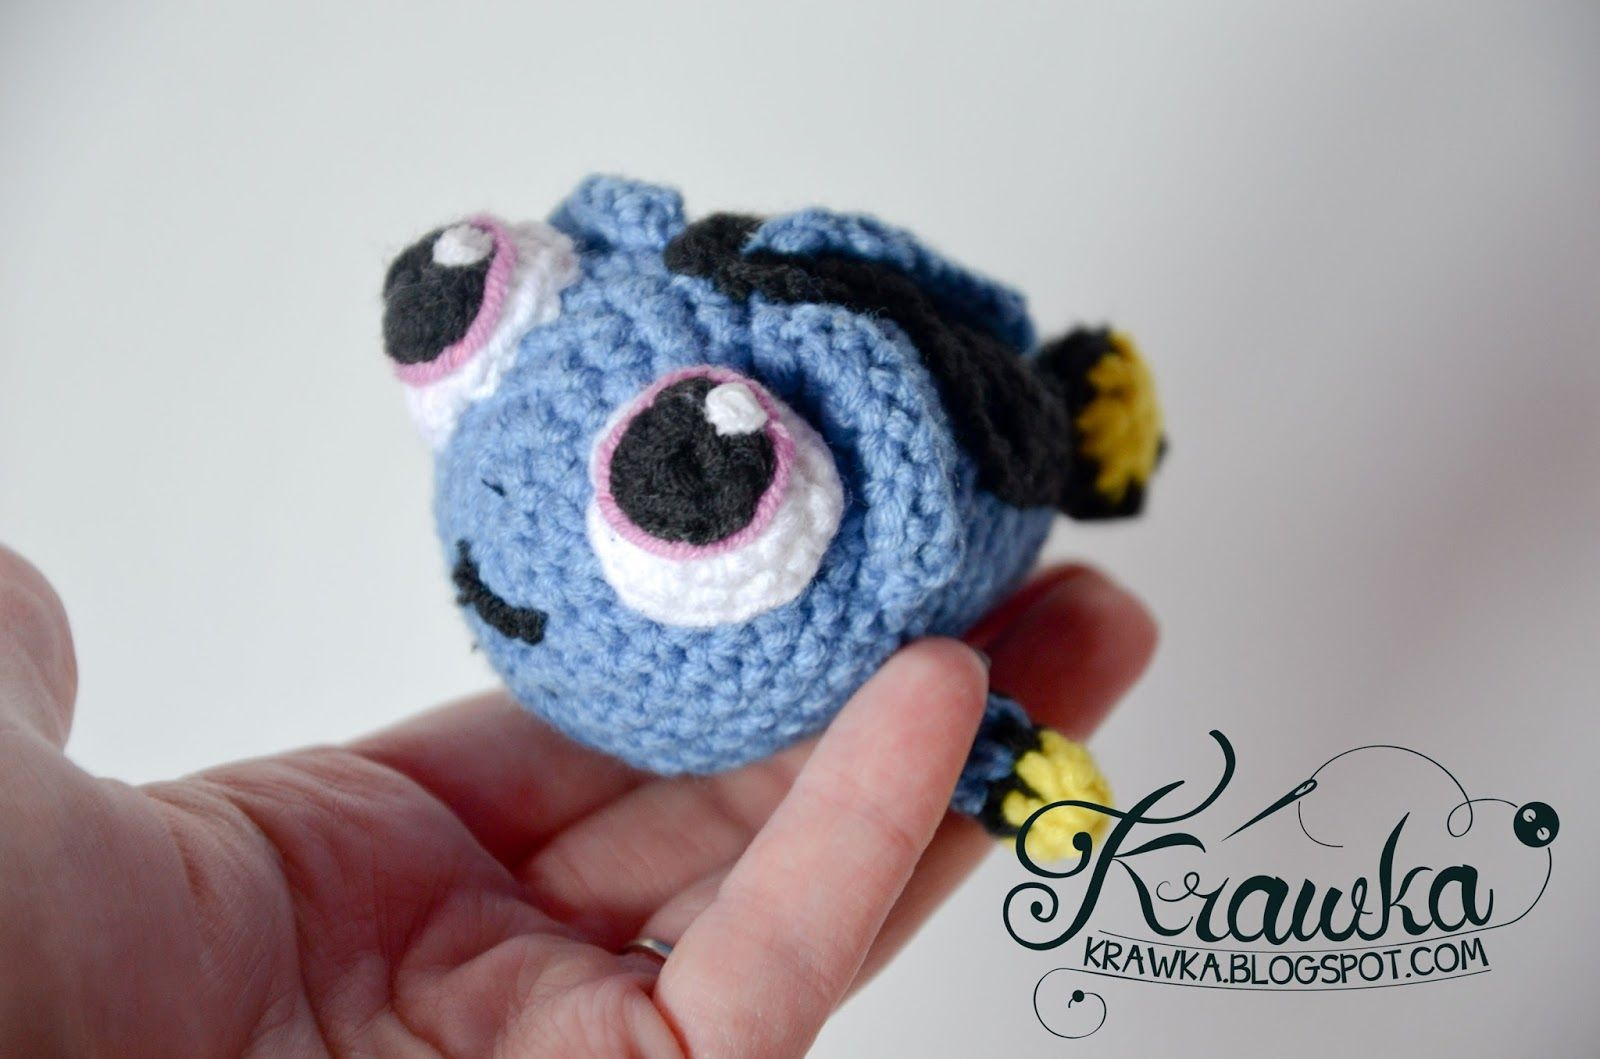 Krawka: Baby Dory crochet free pattern by Krawka. Dory, finding nemo ...